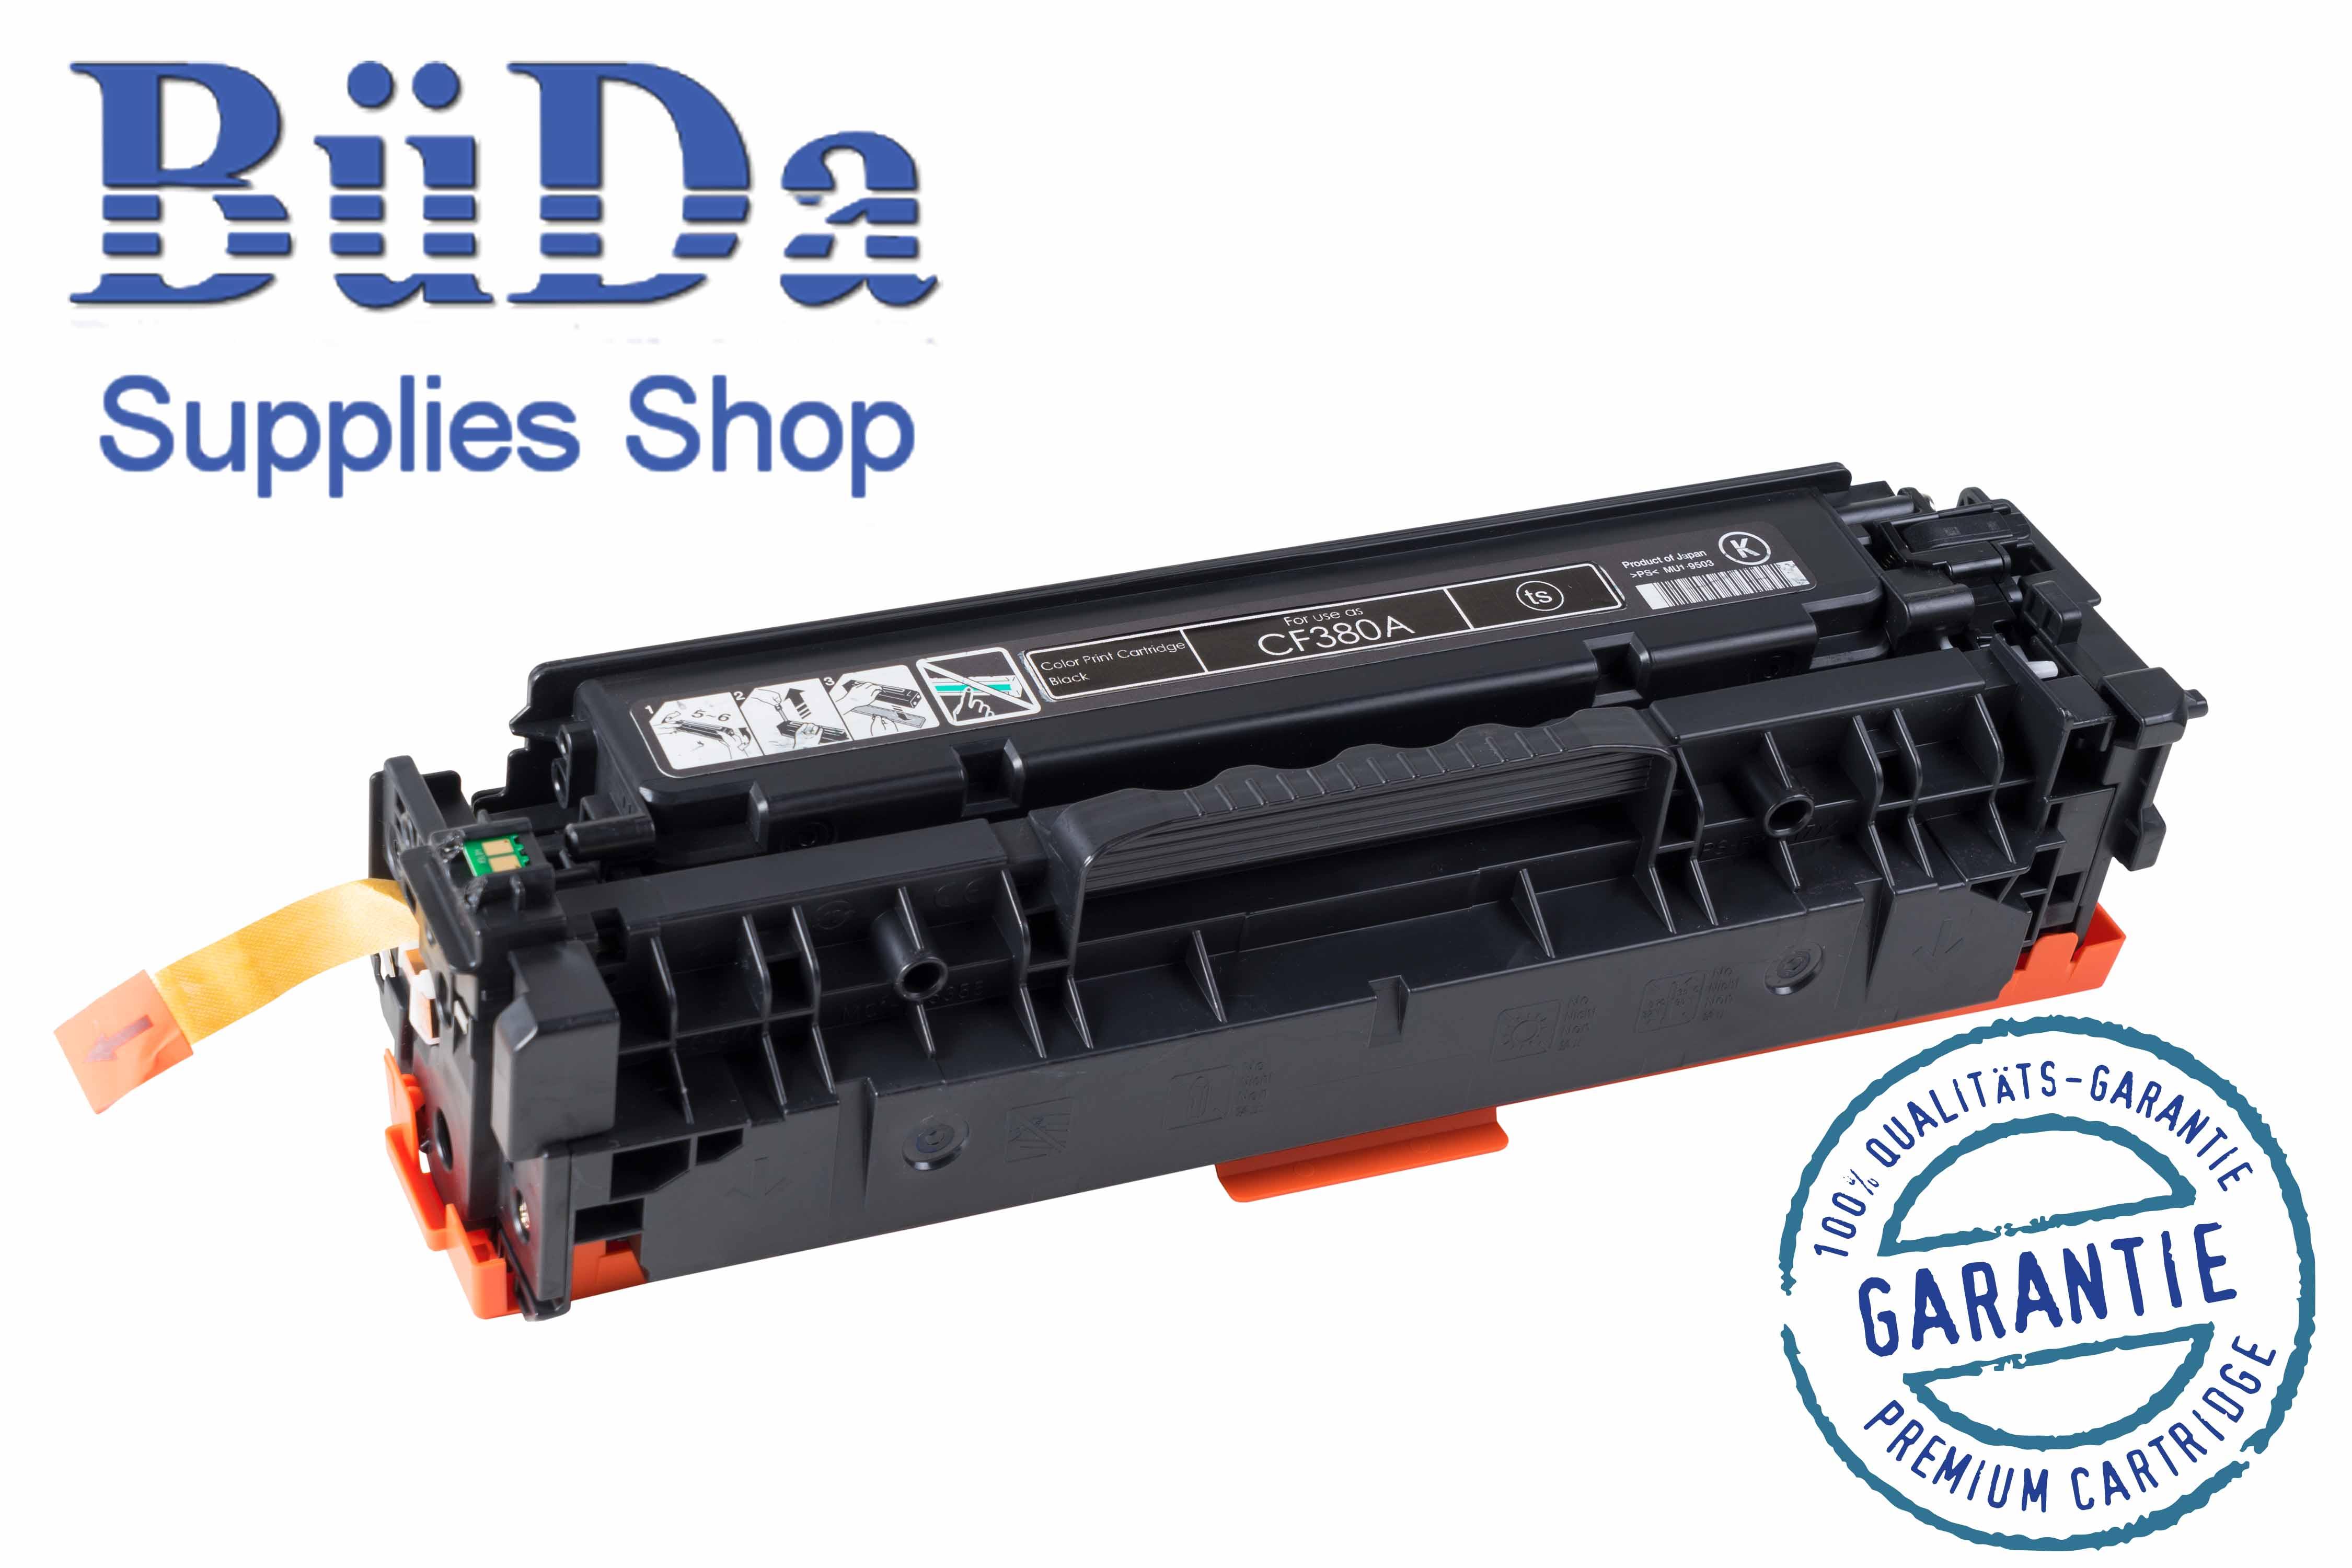 Toner-Modul komp. zu CF380A / 312A black 2400 Seiten